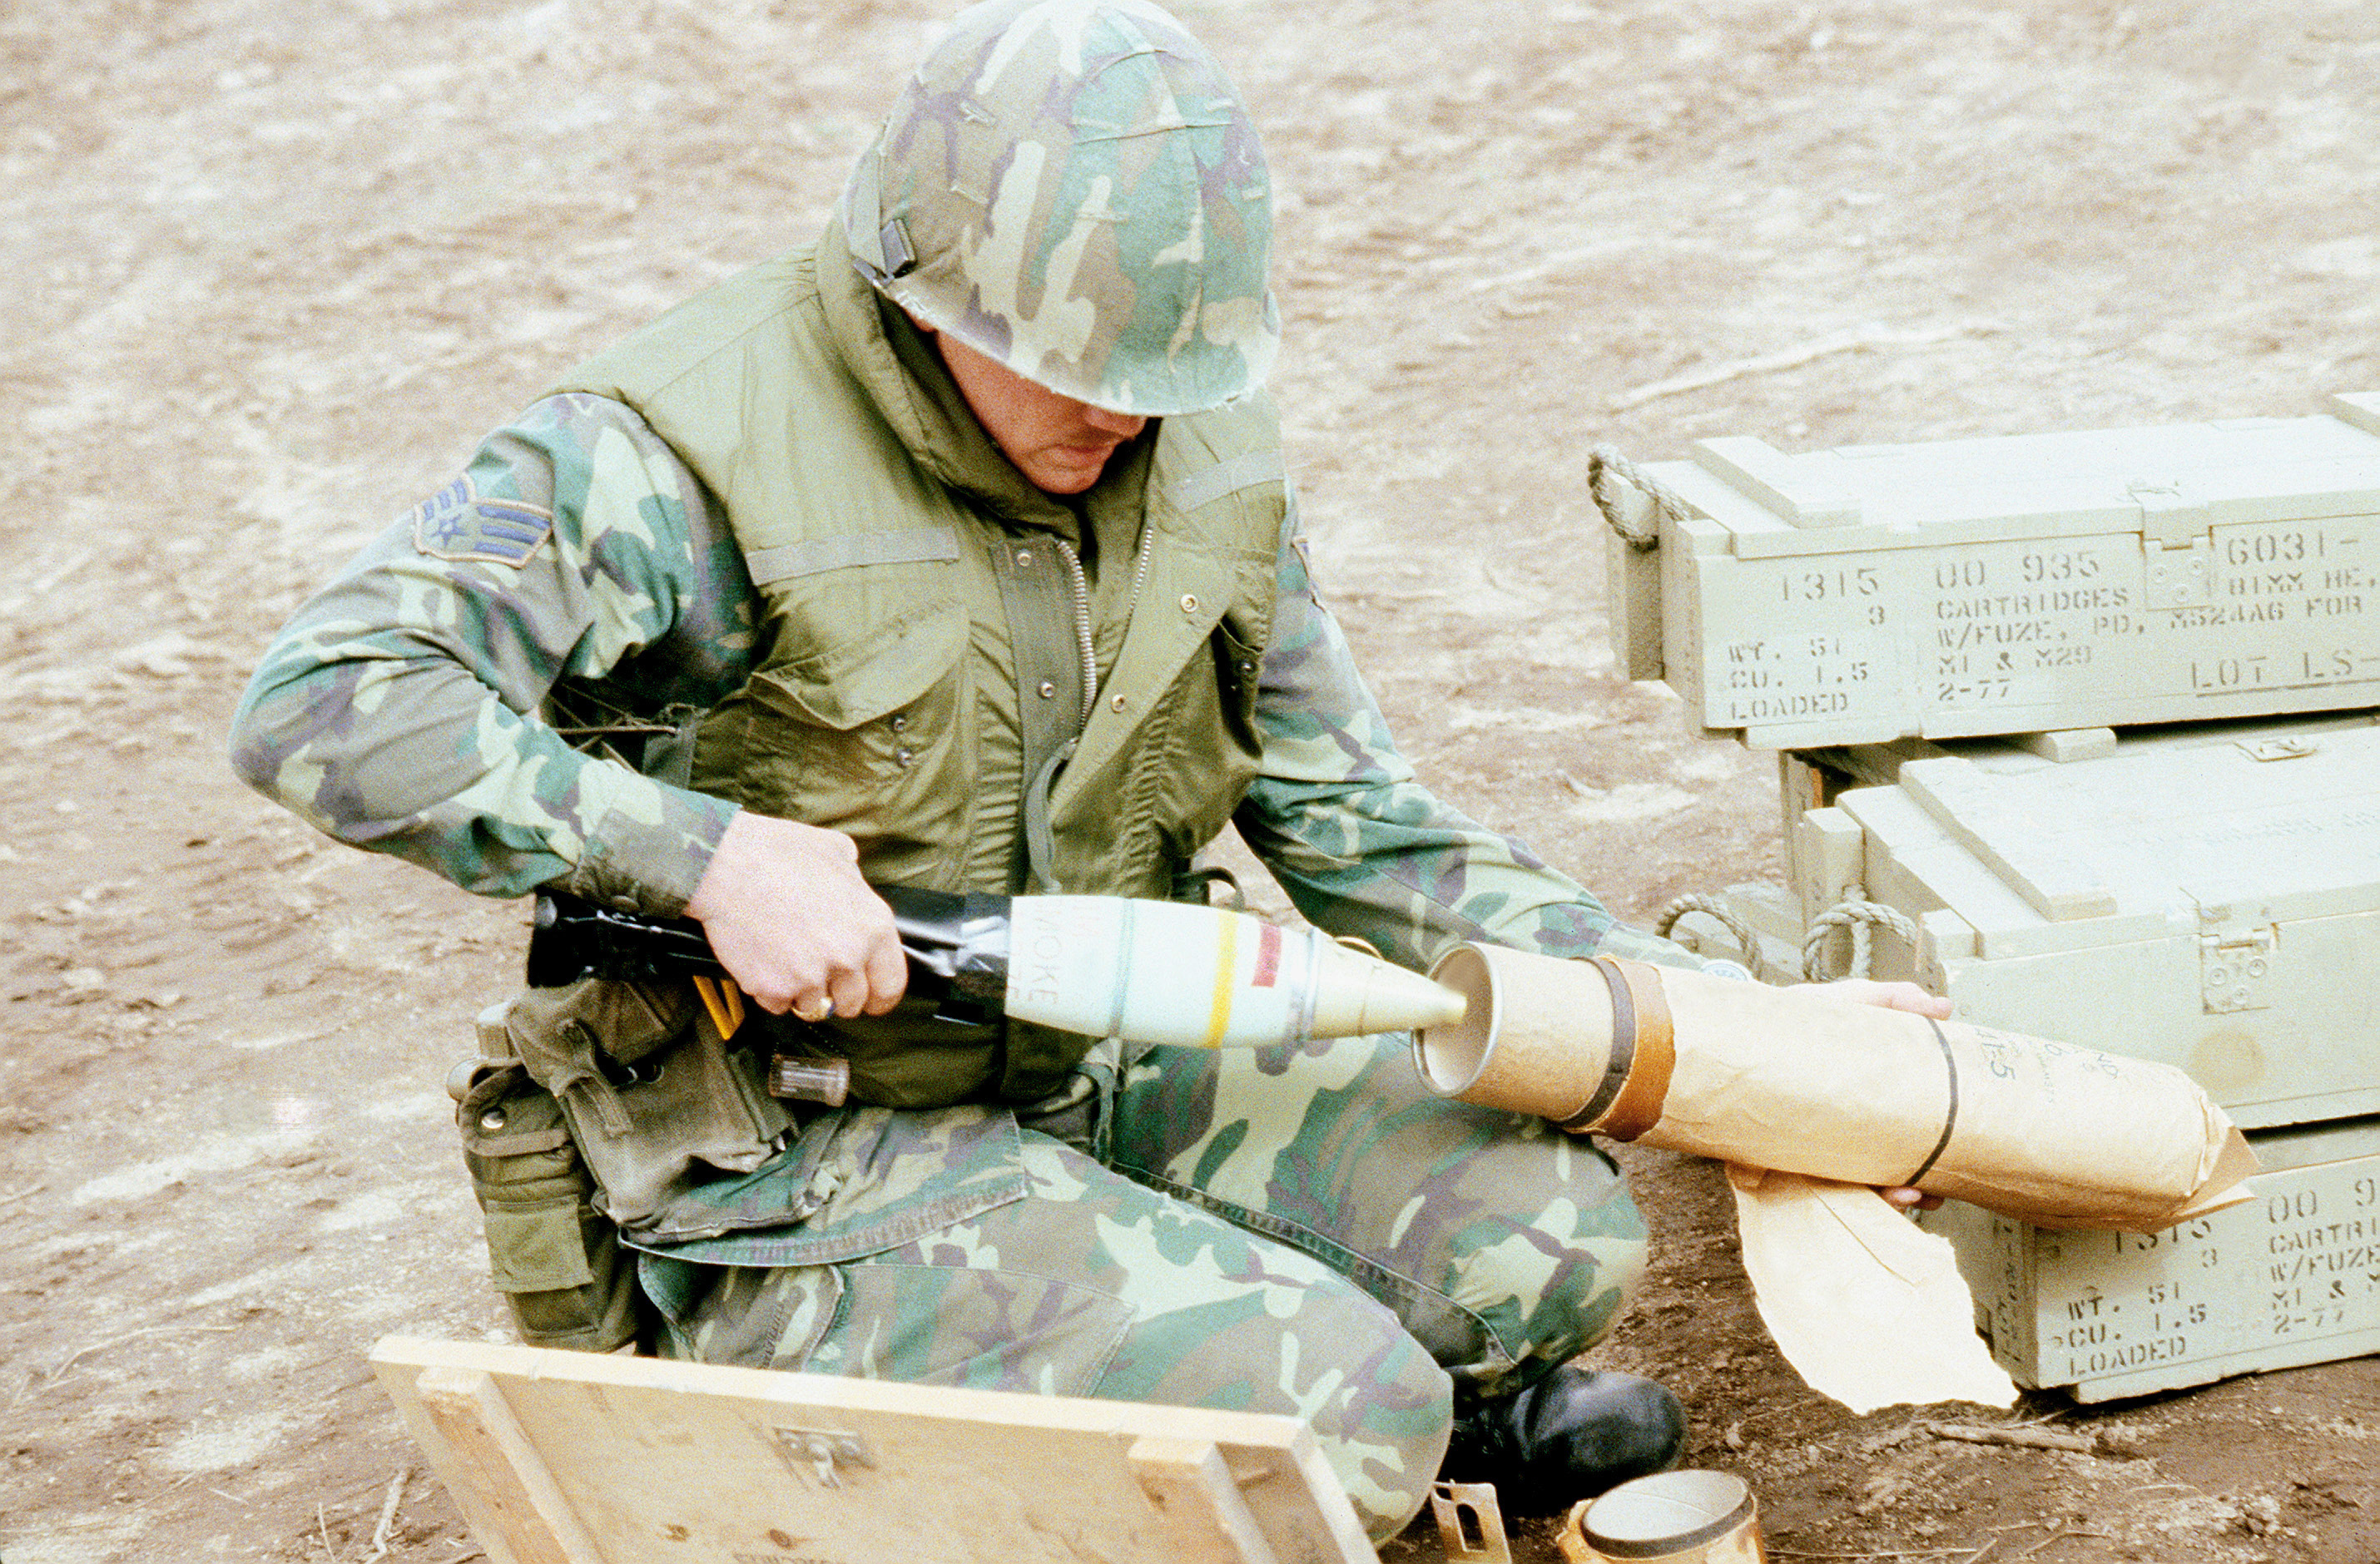 File:White Phosphorous mortar round jpg - Wikimedia Commons